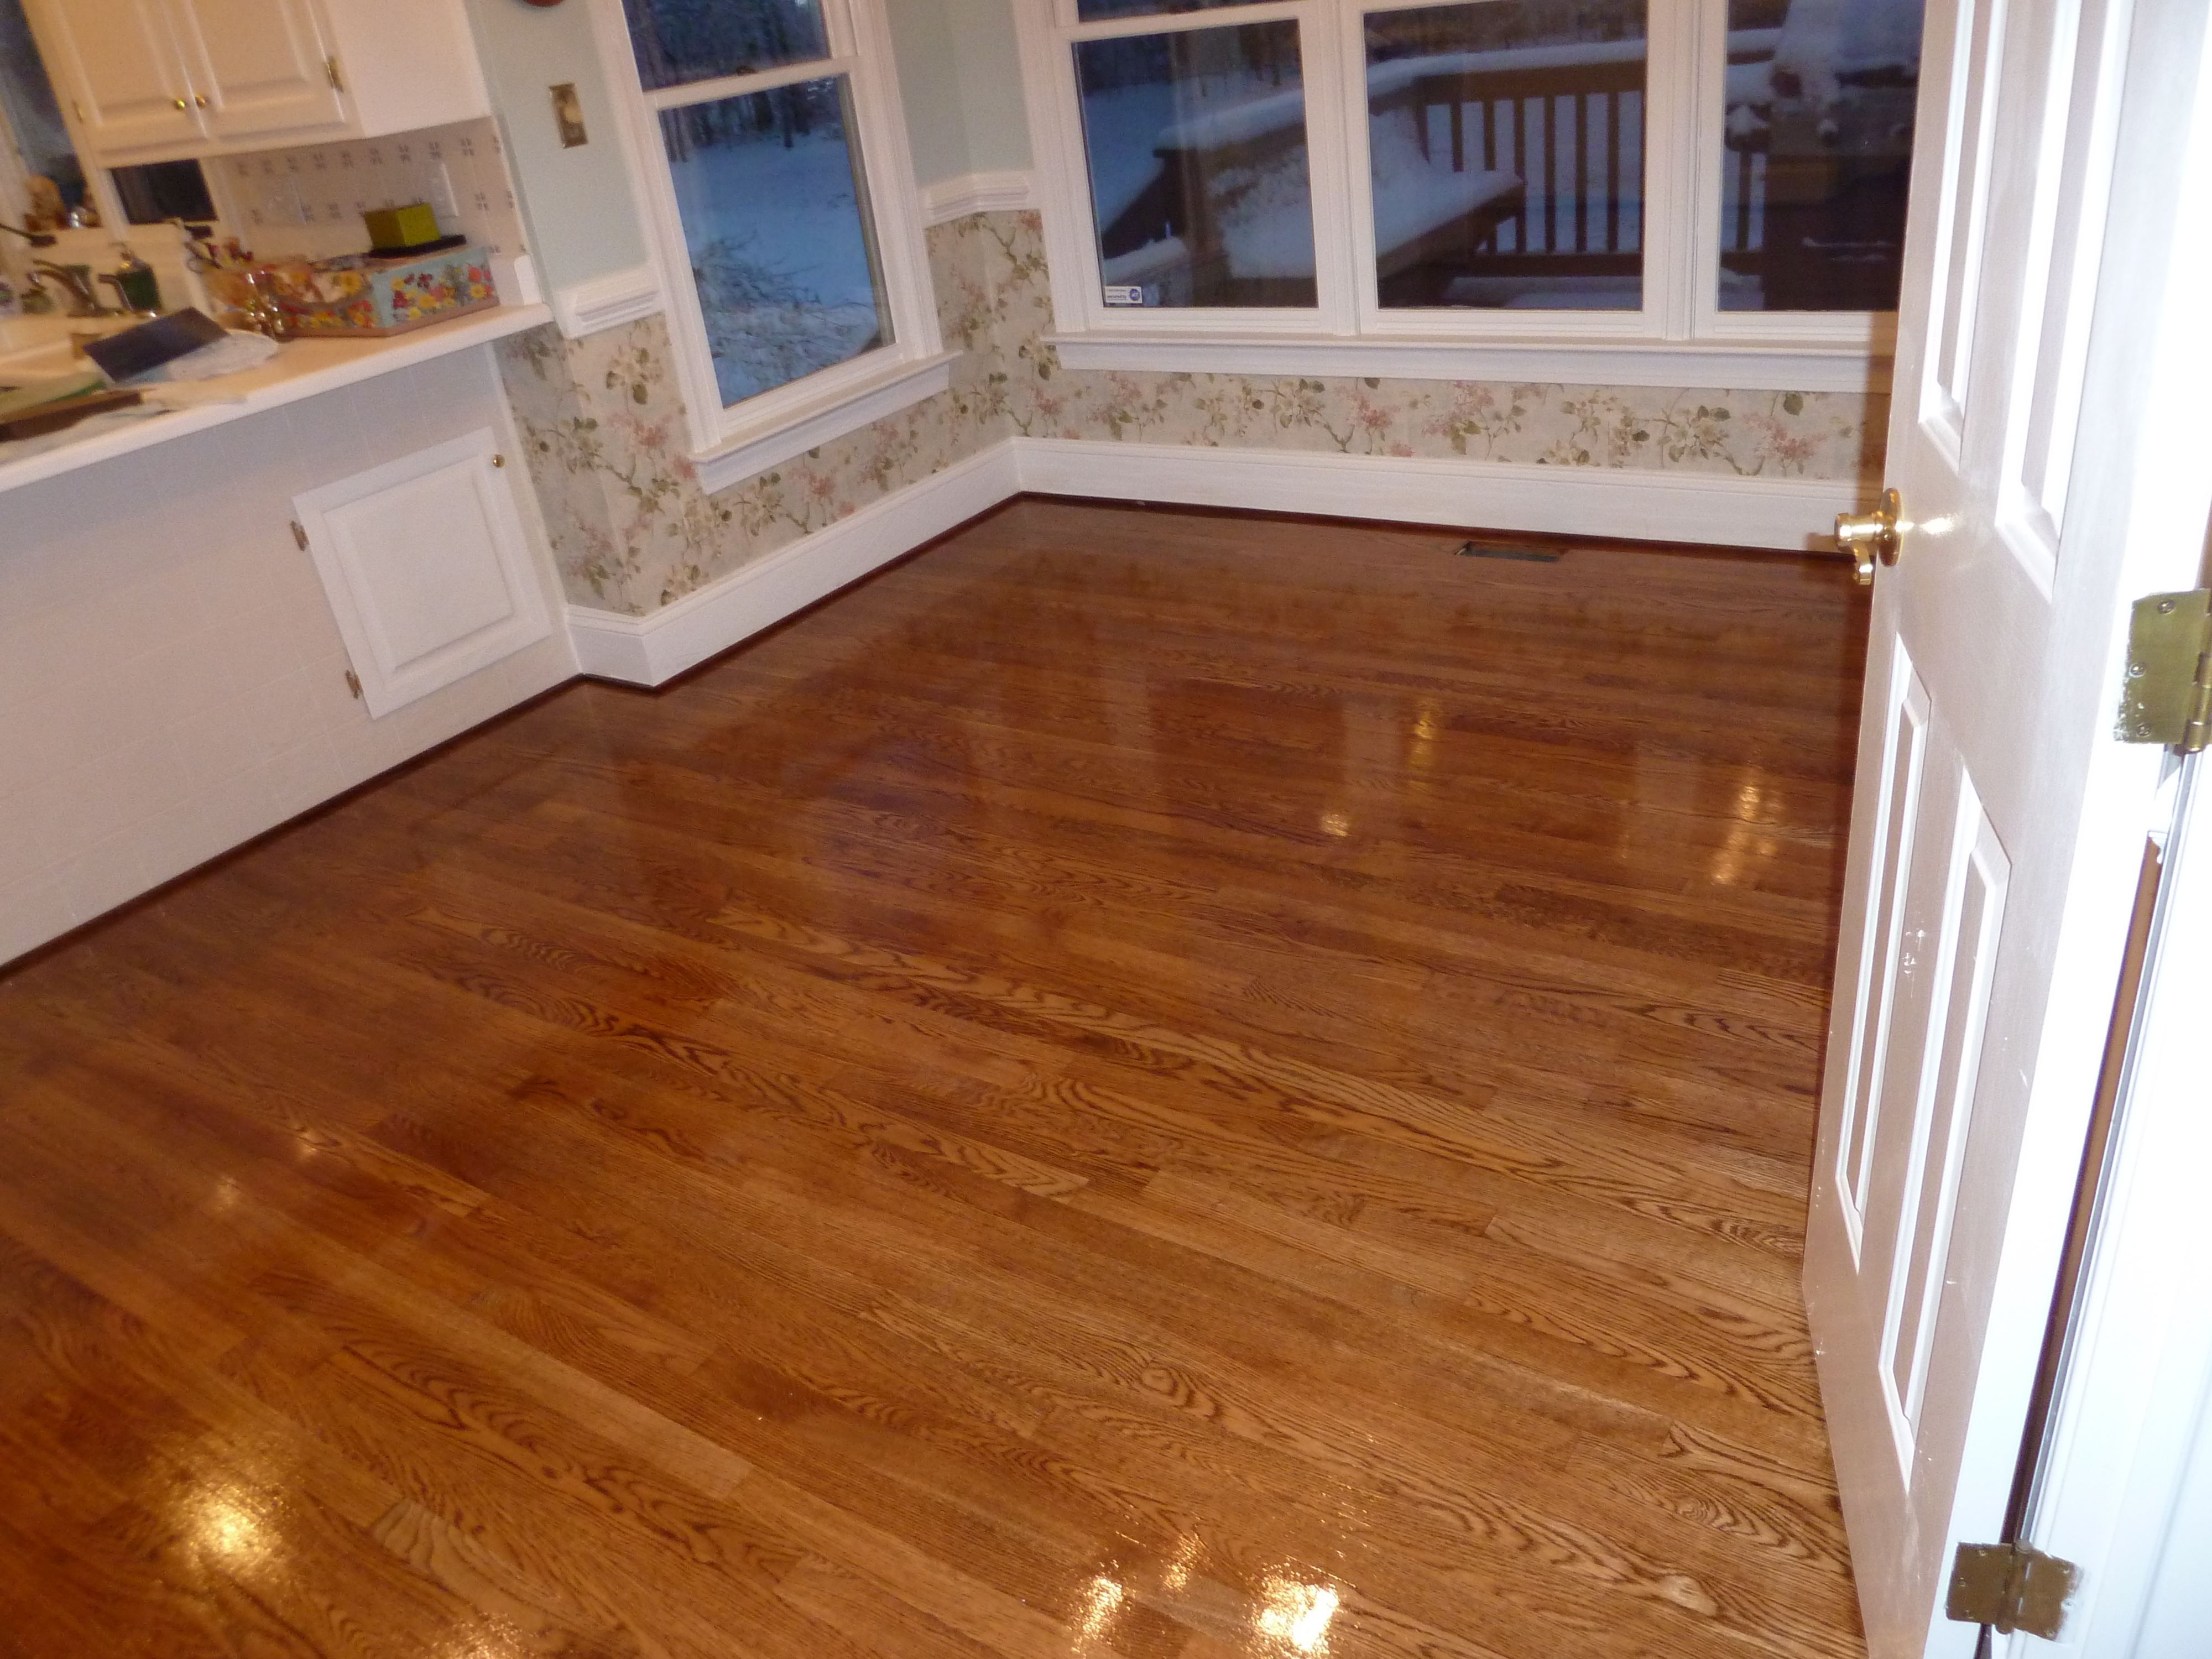 2 3 4 Red Oak Hardwood Flooring Stained Golden Oak And